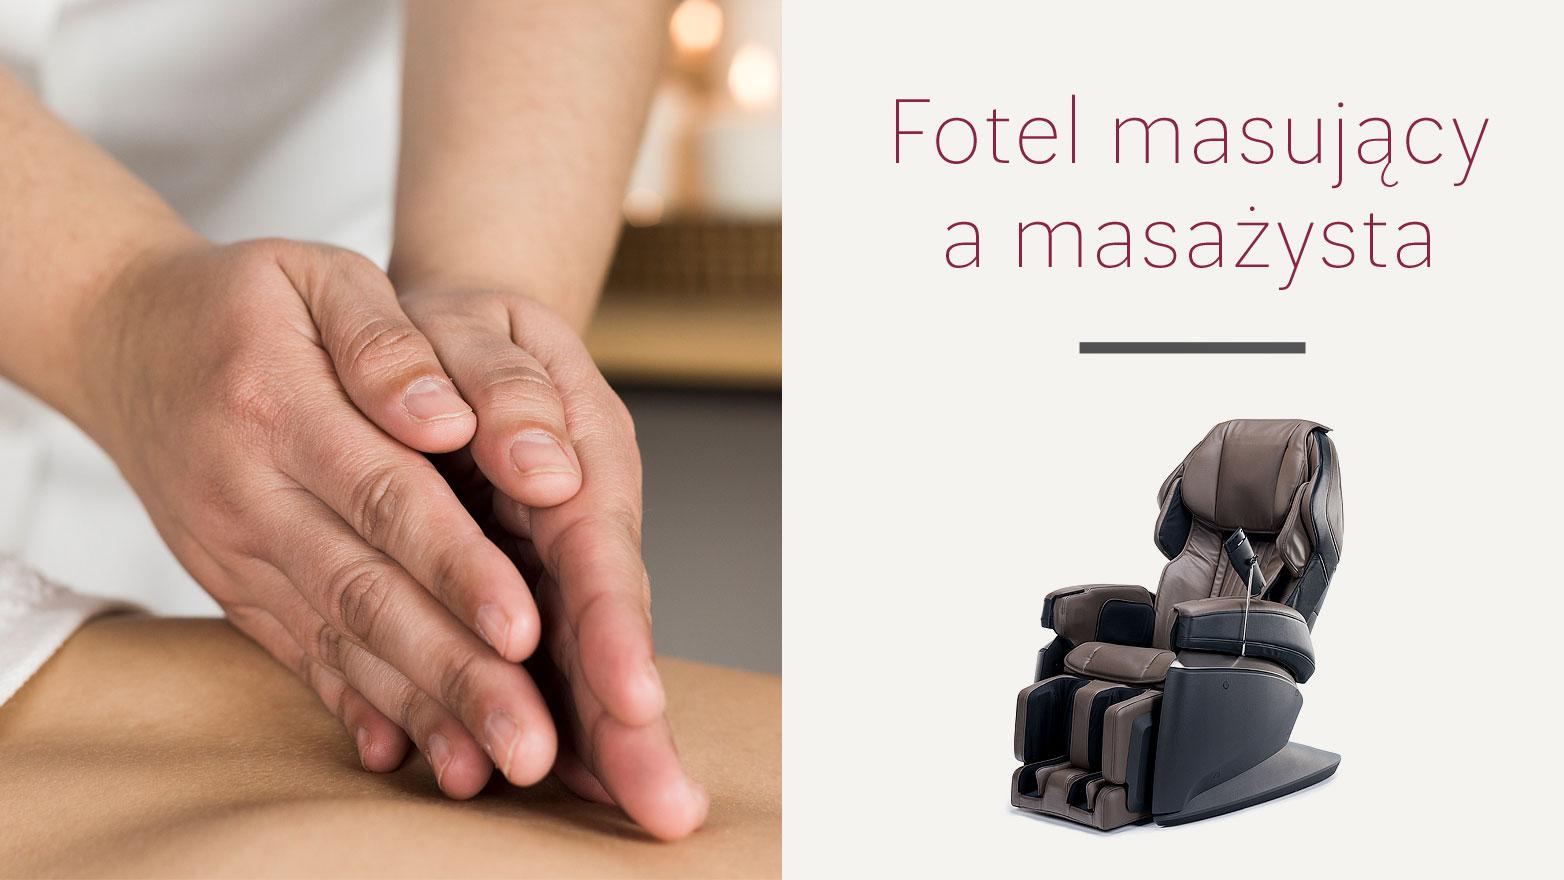 Fotel masujący a masażysta